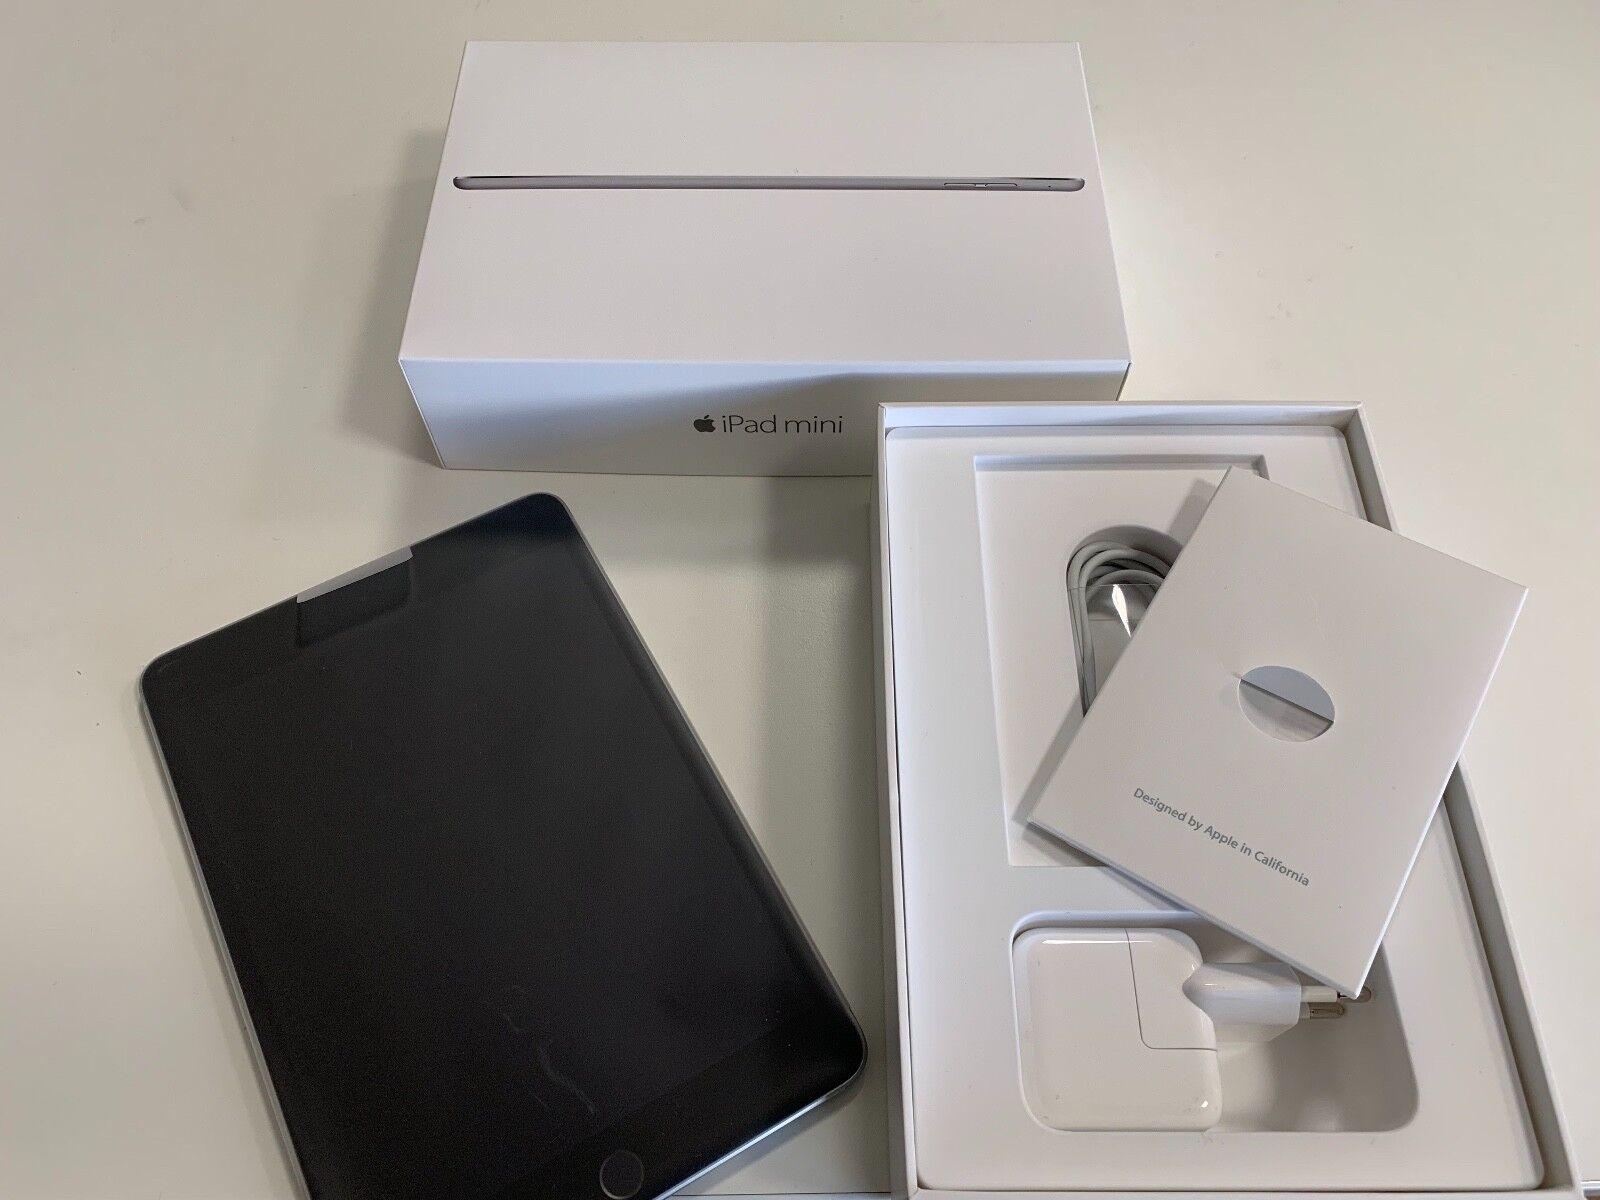 Apple iPad mini 4 32GB, WLAN, (7,9 Zoll) - Spacegrau -entsperrt